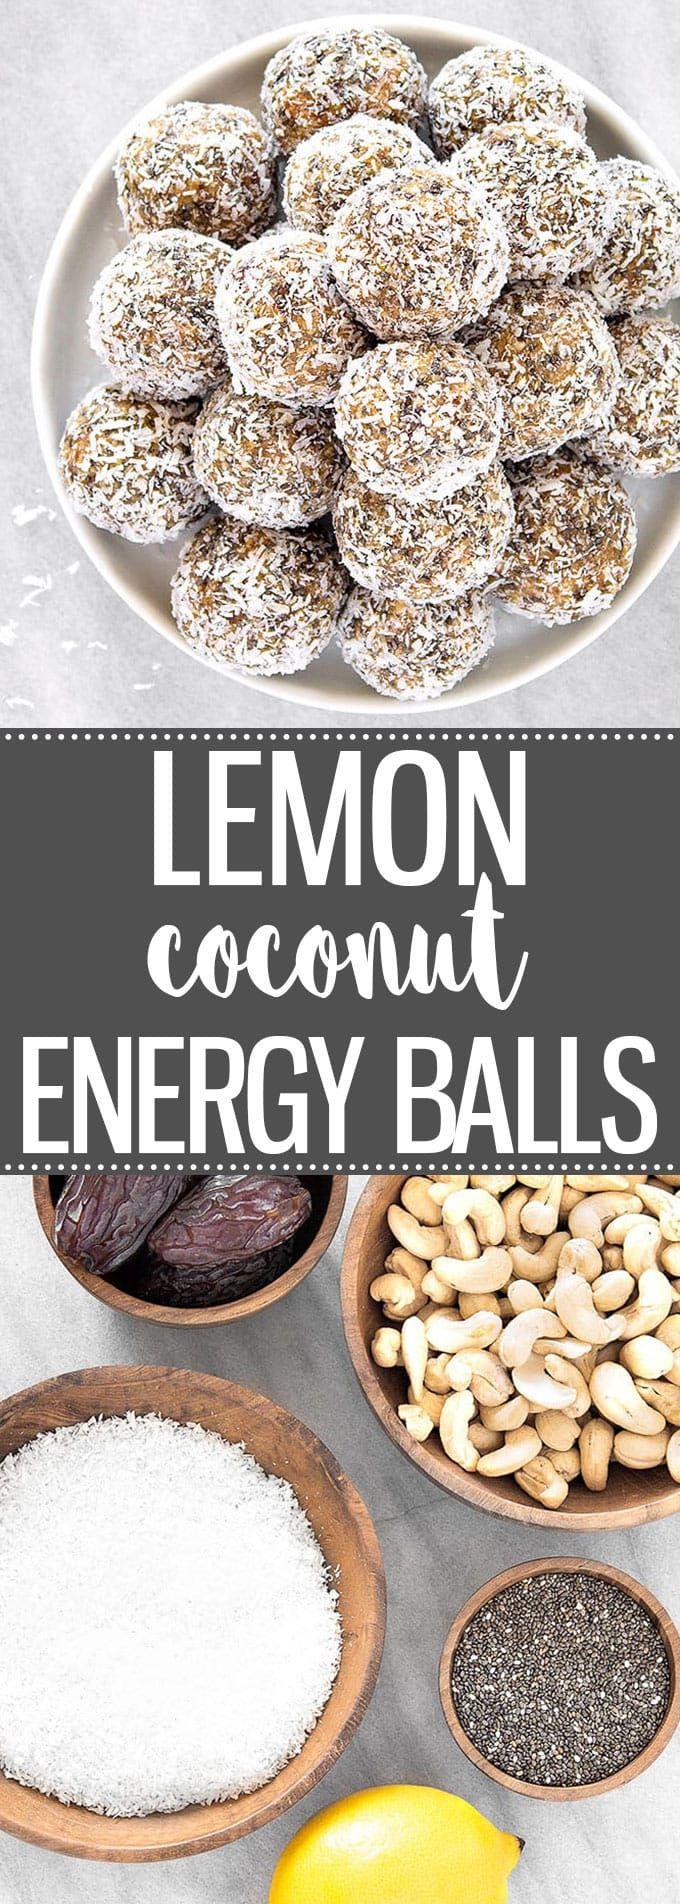 Healthy Lemon Coconut Energy Balls - No-bake snacks packed with cashew nuts, coconut, dates, chia seeds, lemon. Vegan, Paleo, Gluten Free